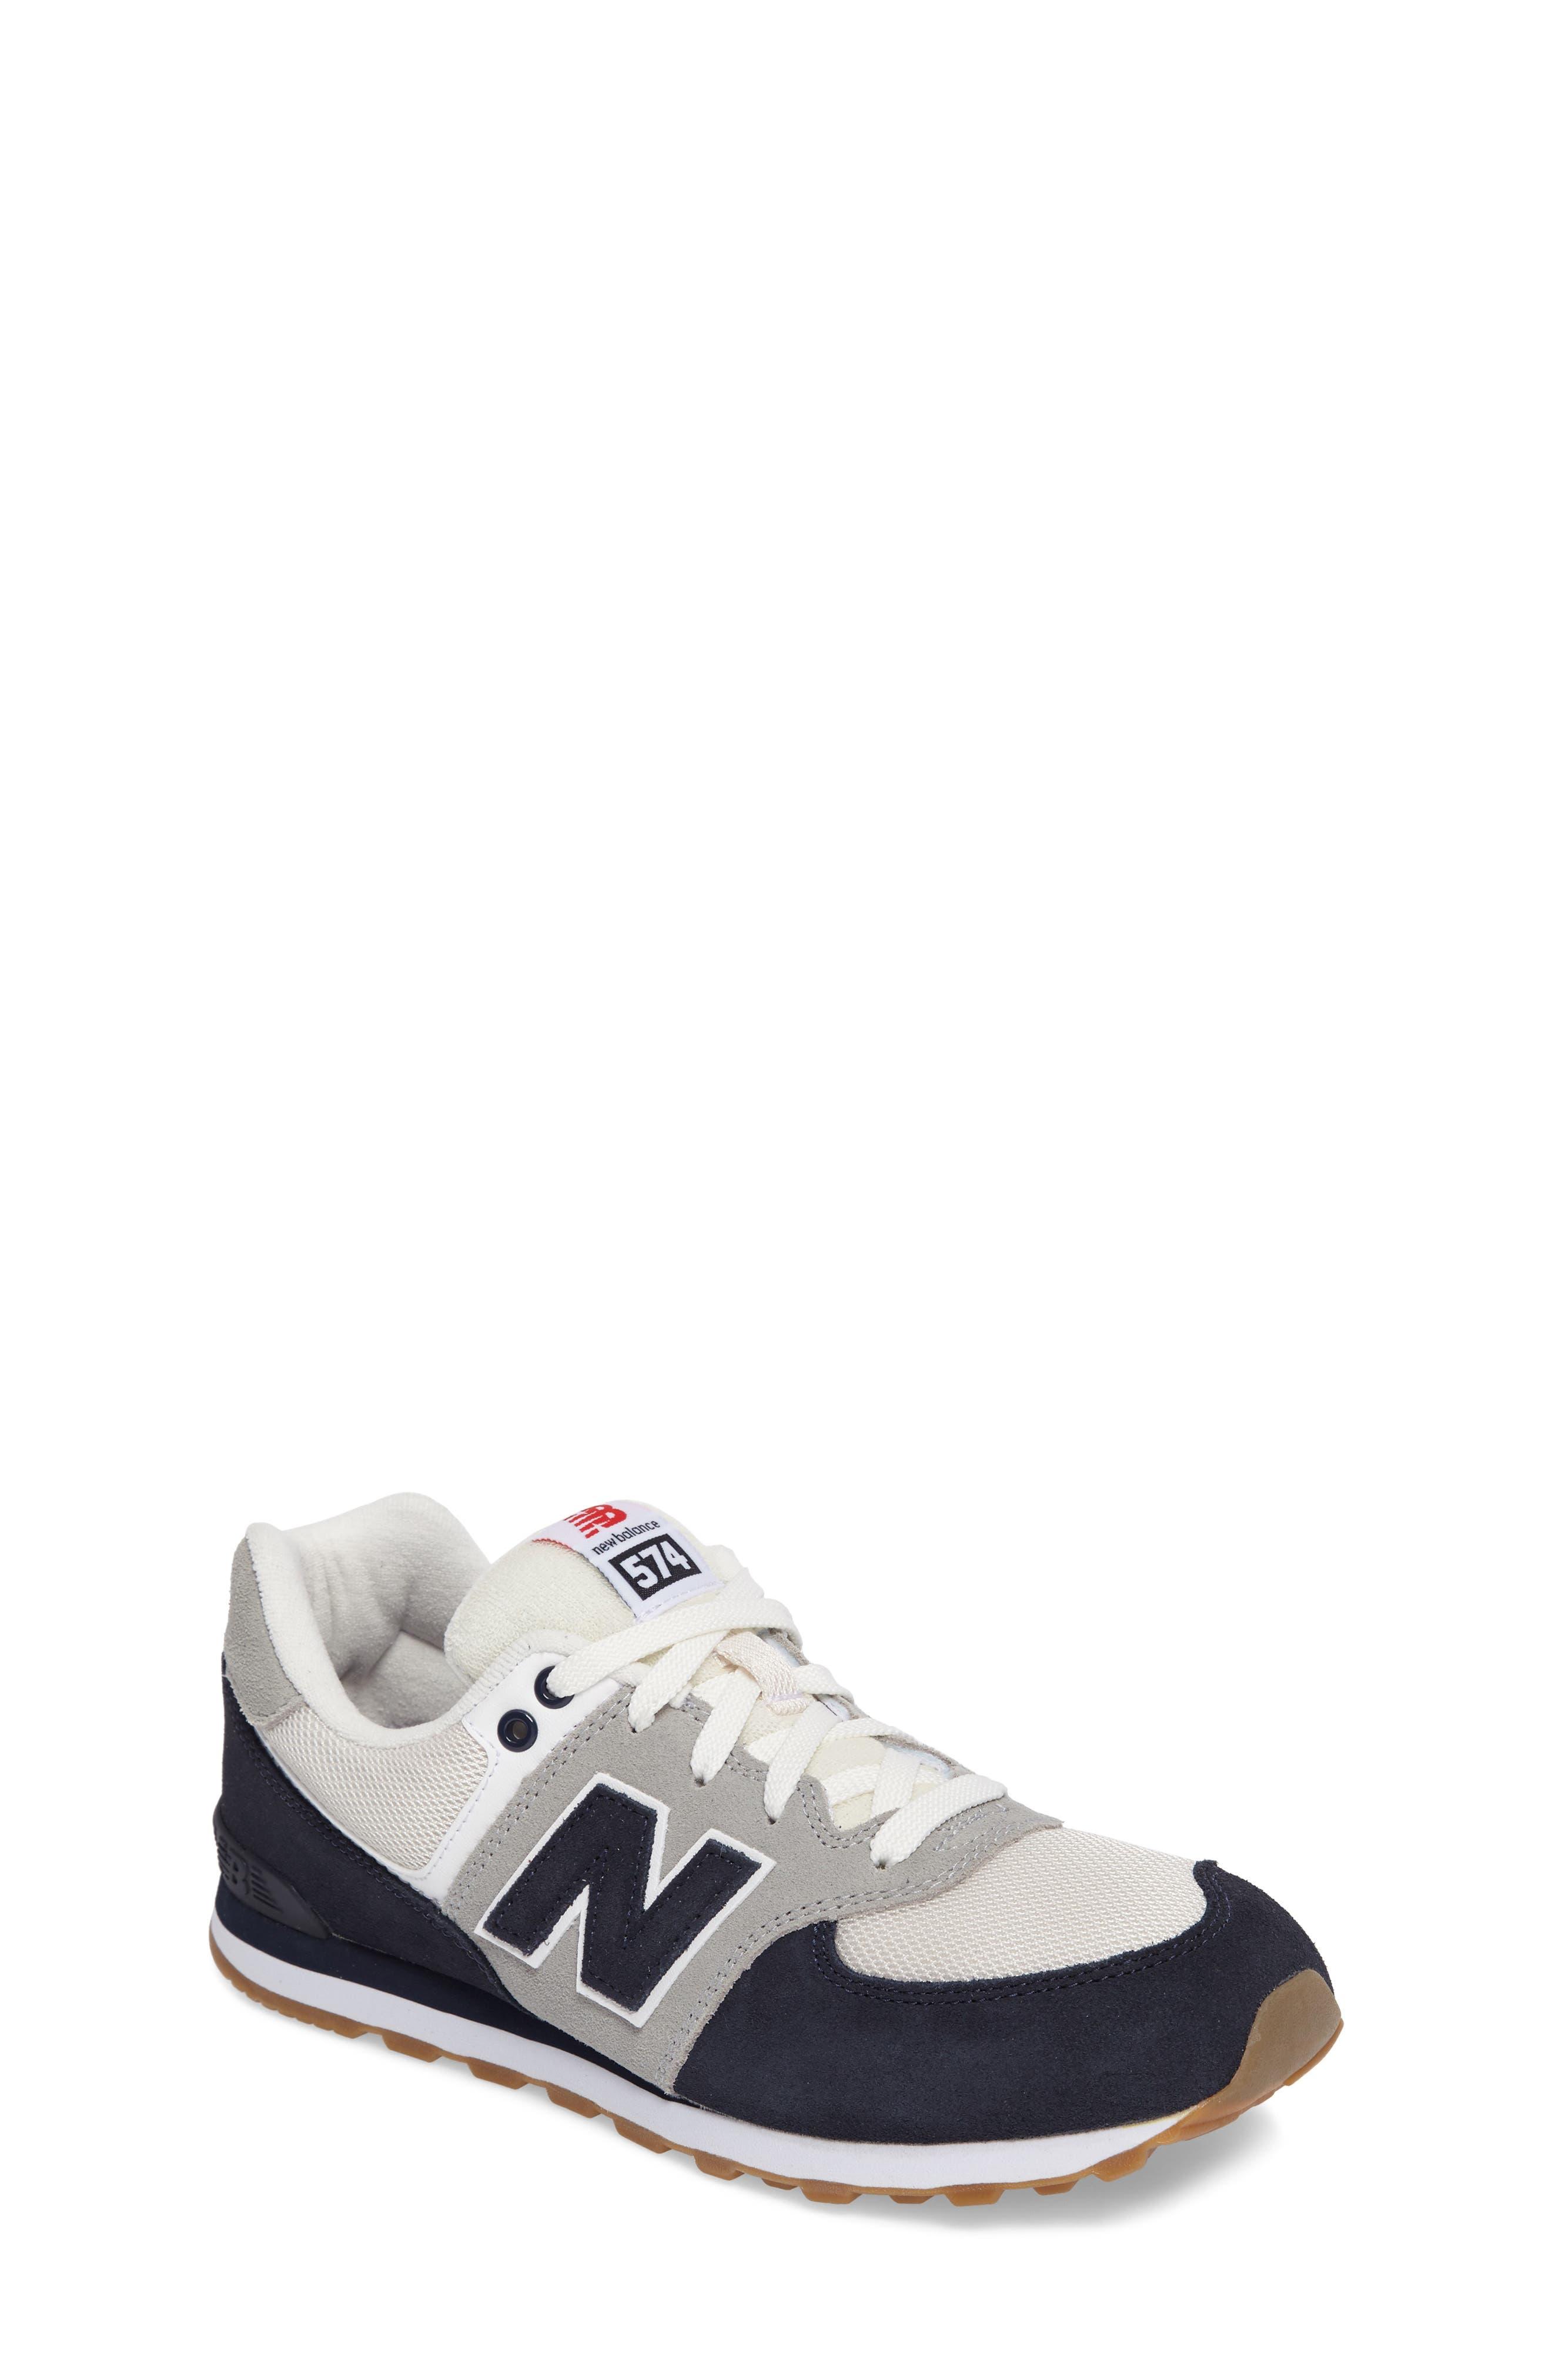 New Balance 574 Resort Sporty Sneaker (Big Kid)